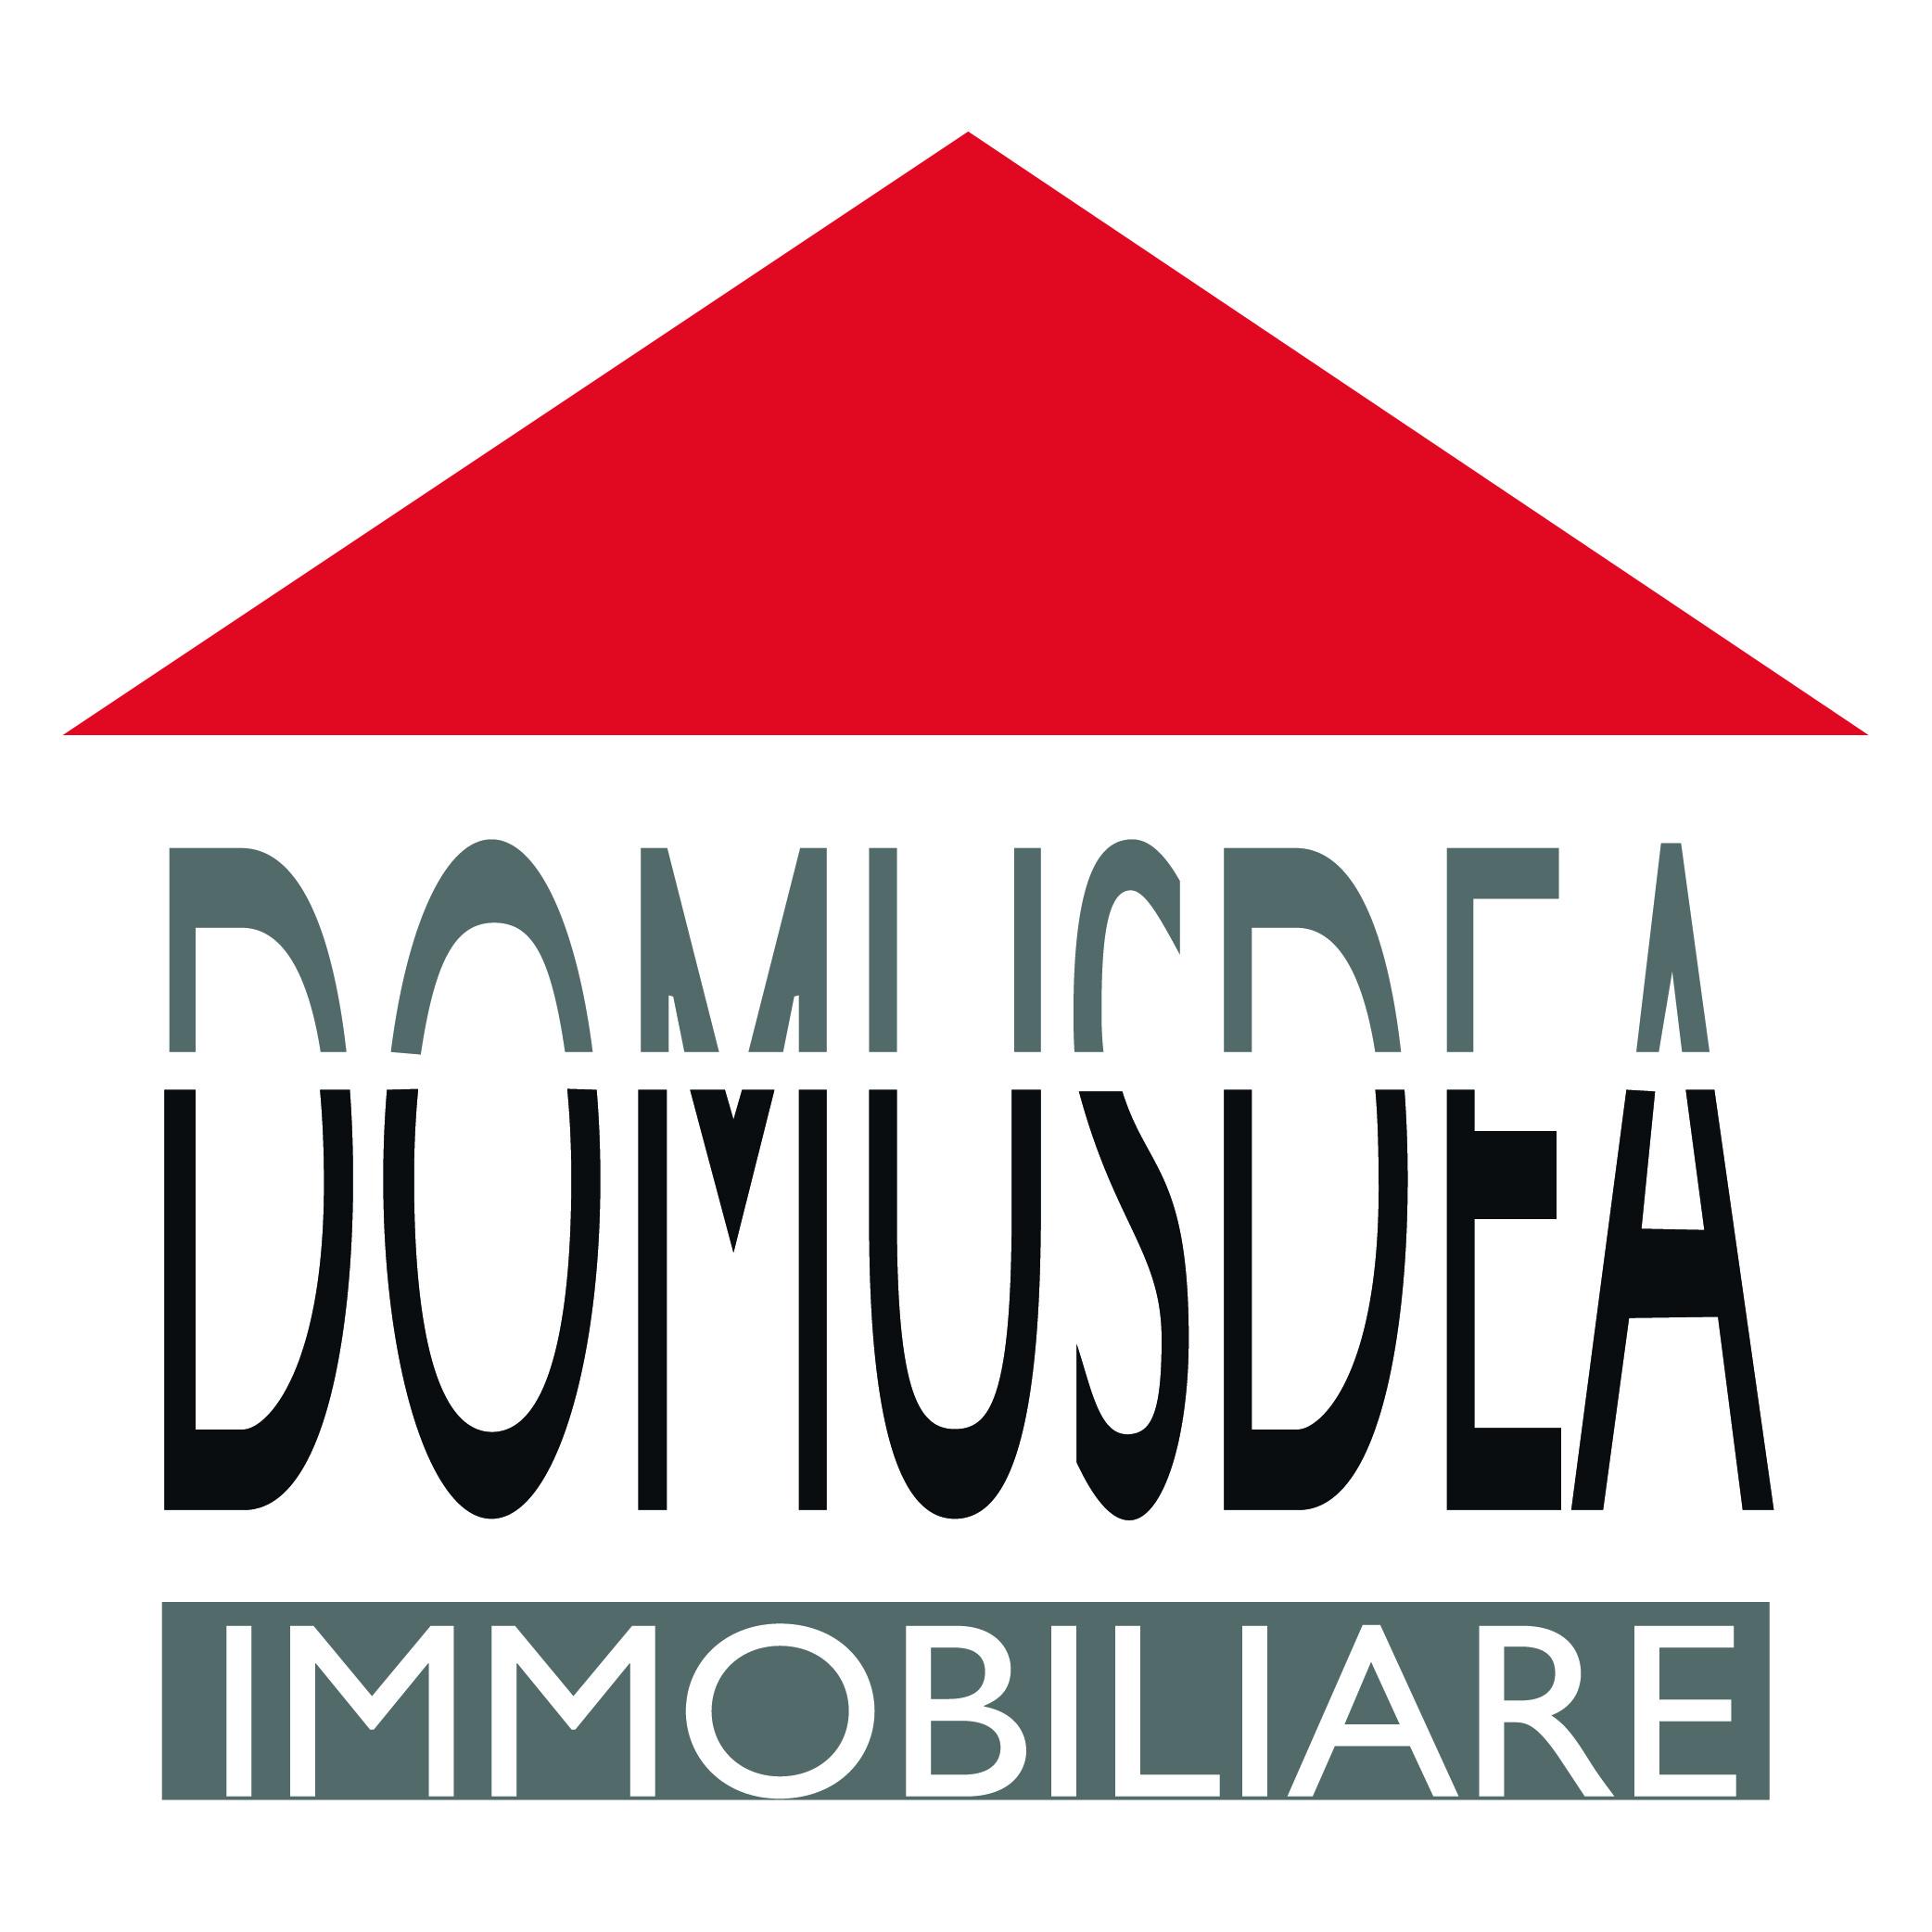 Domusdea